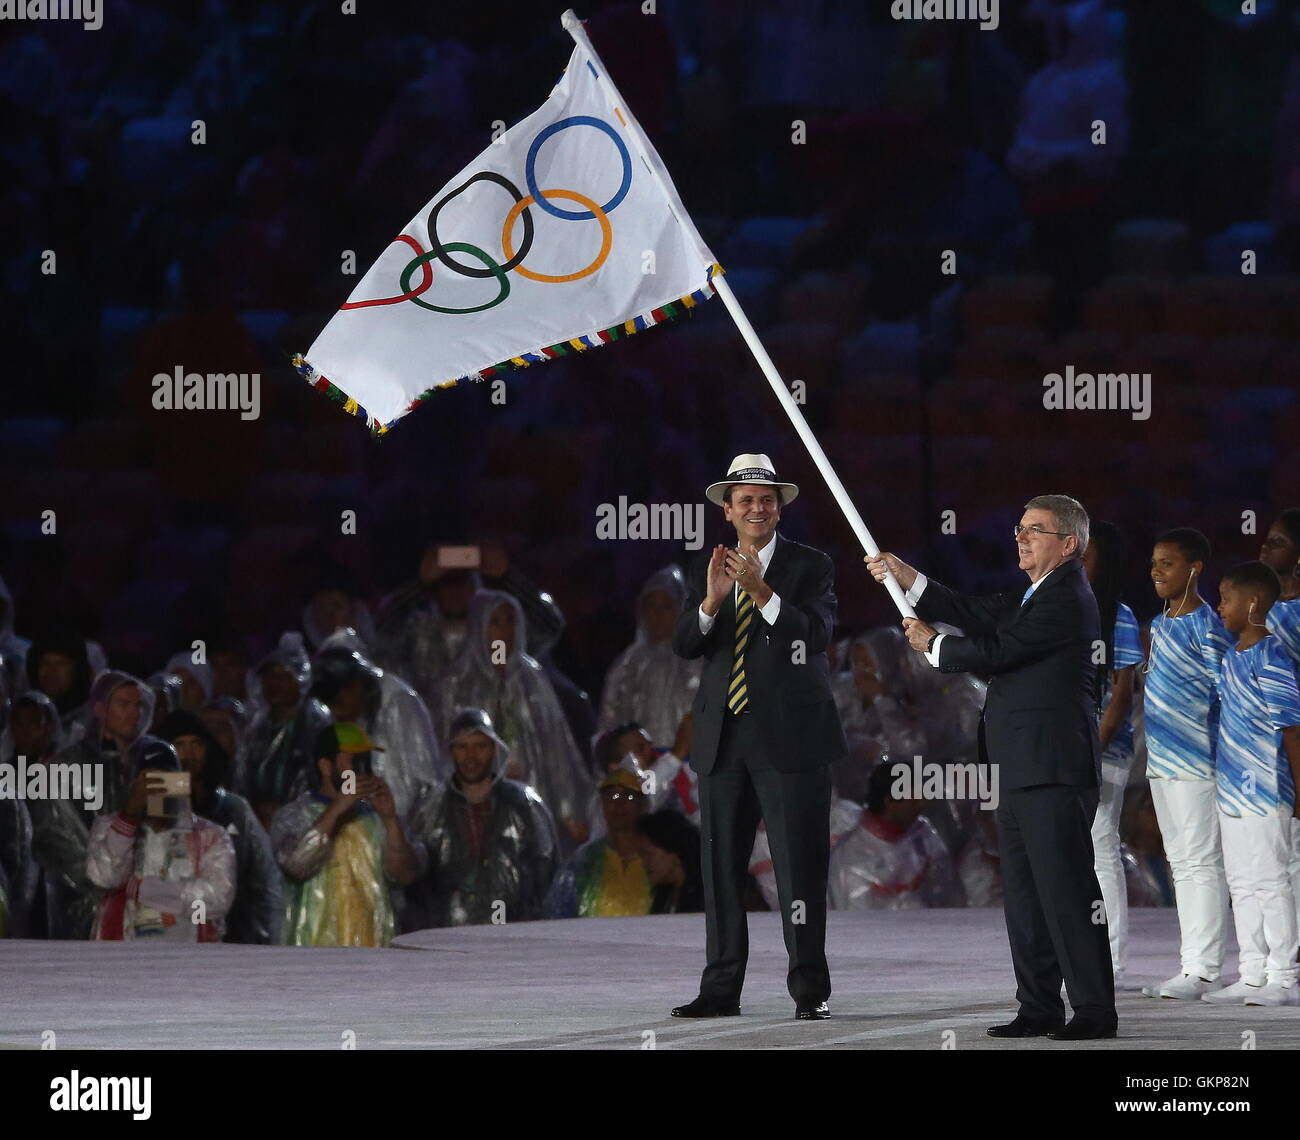 Rio De Janeiro, Brazil. 21st Aug, 2016. Rio de Janeiro Mayor Eduardo Paes (L) and International Olympic Committee - Stock Image